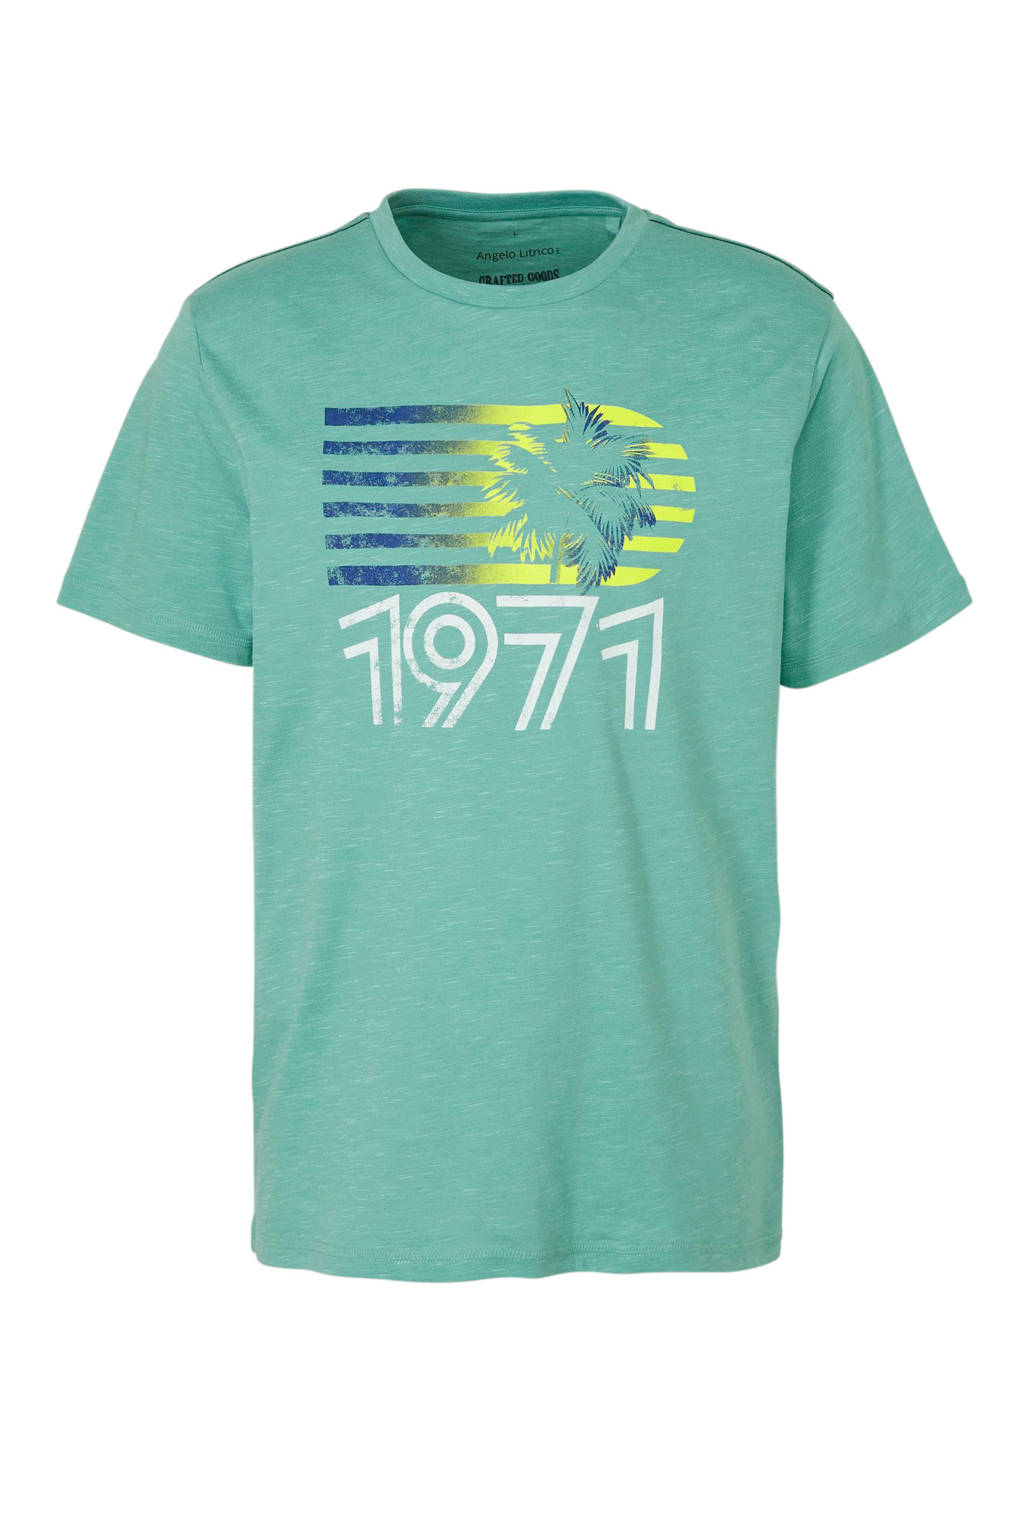 C&A Angelo Litrico T-shirt met printopdruk, Blauw